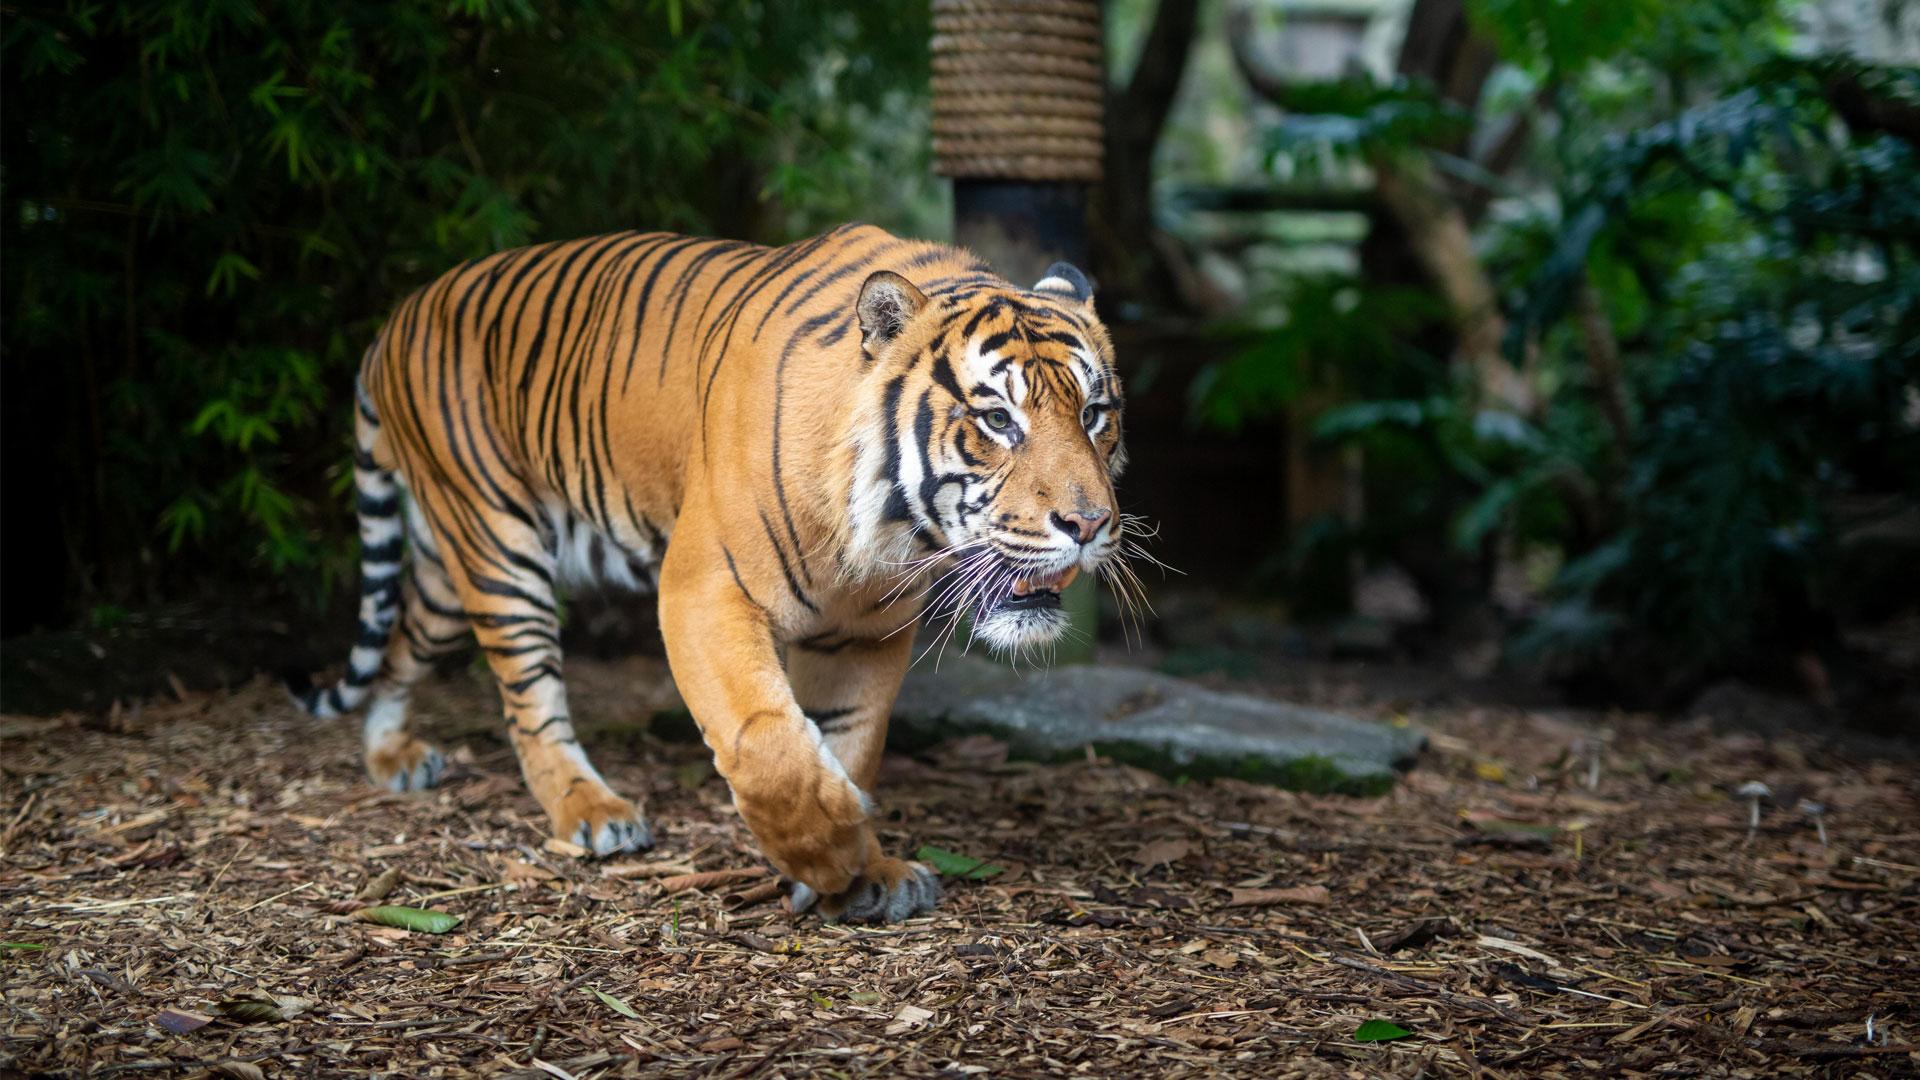 https://rfacdn.nz/zoo/assets/media/berani-gallery-2.jpg